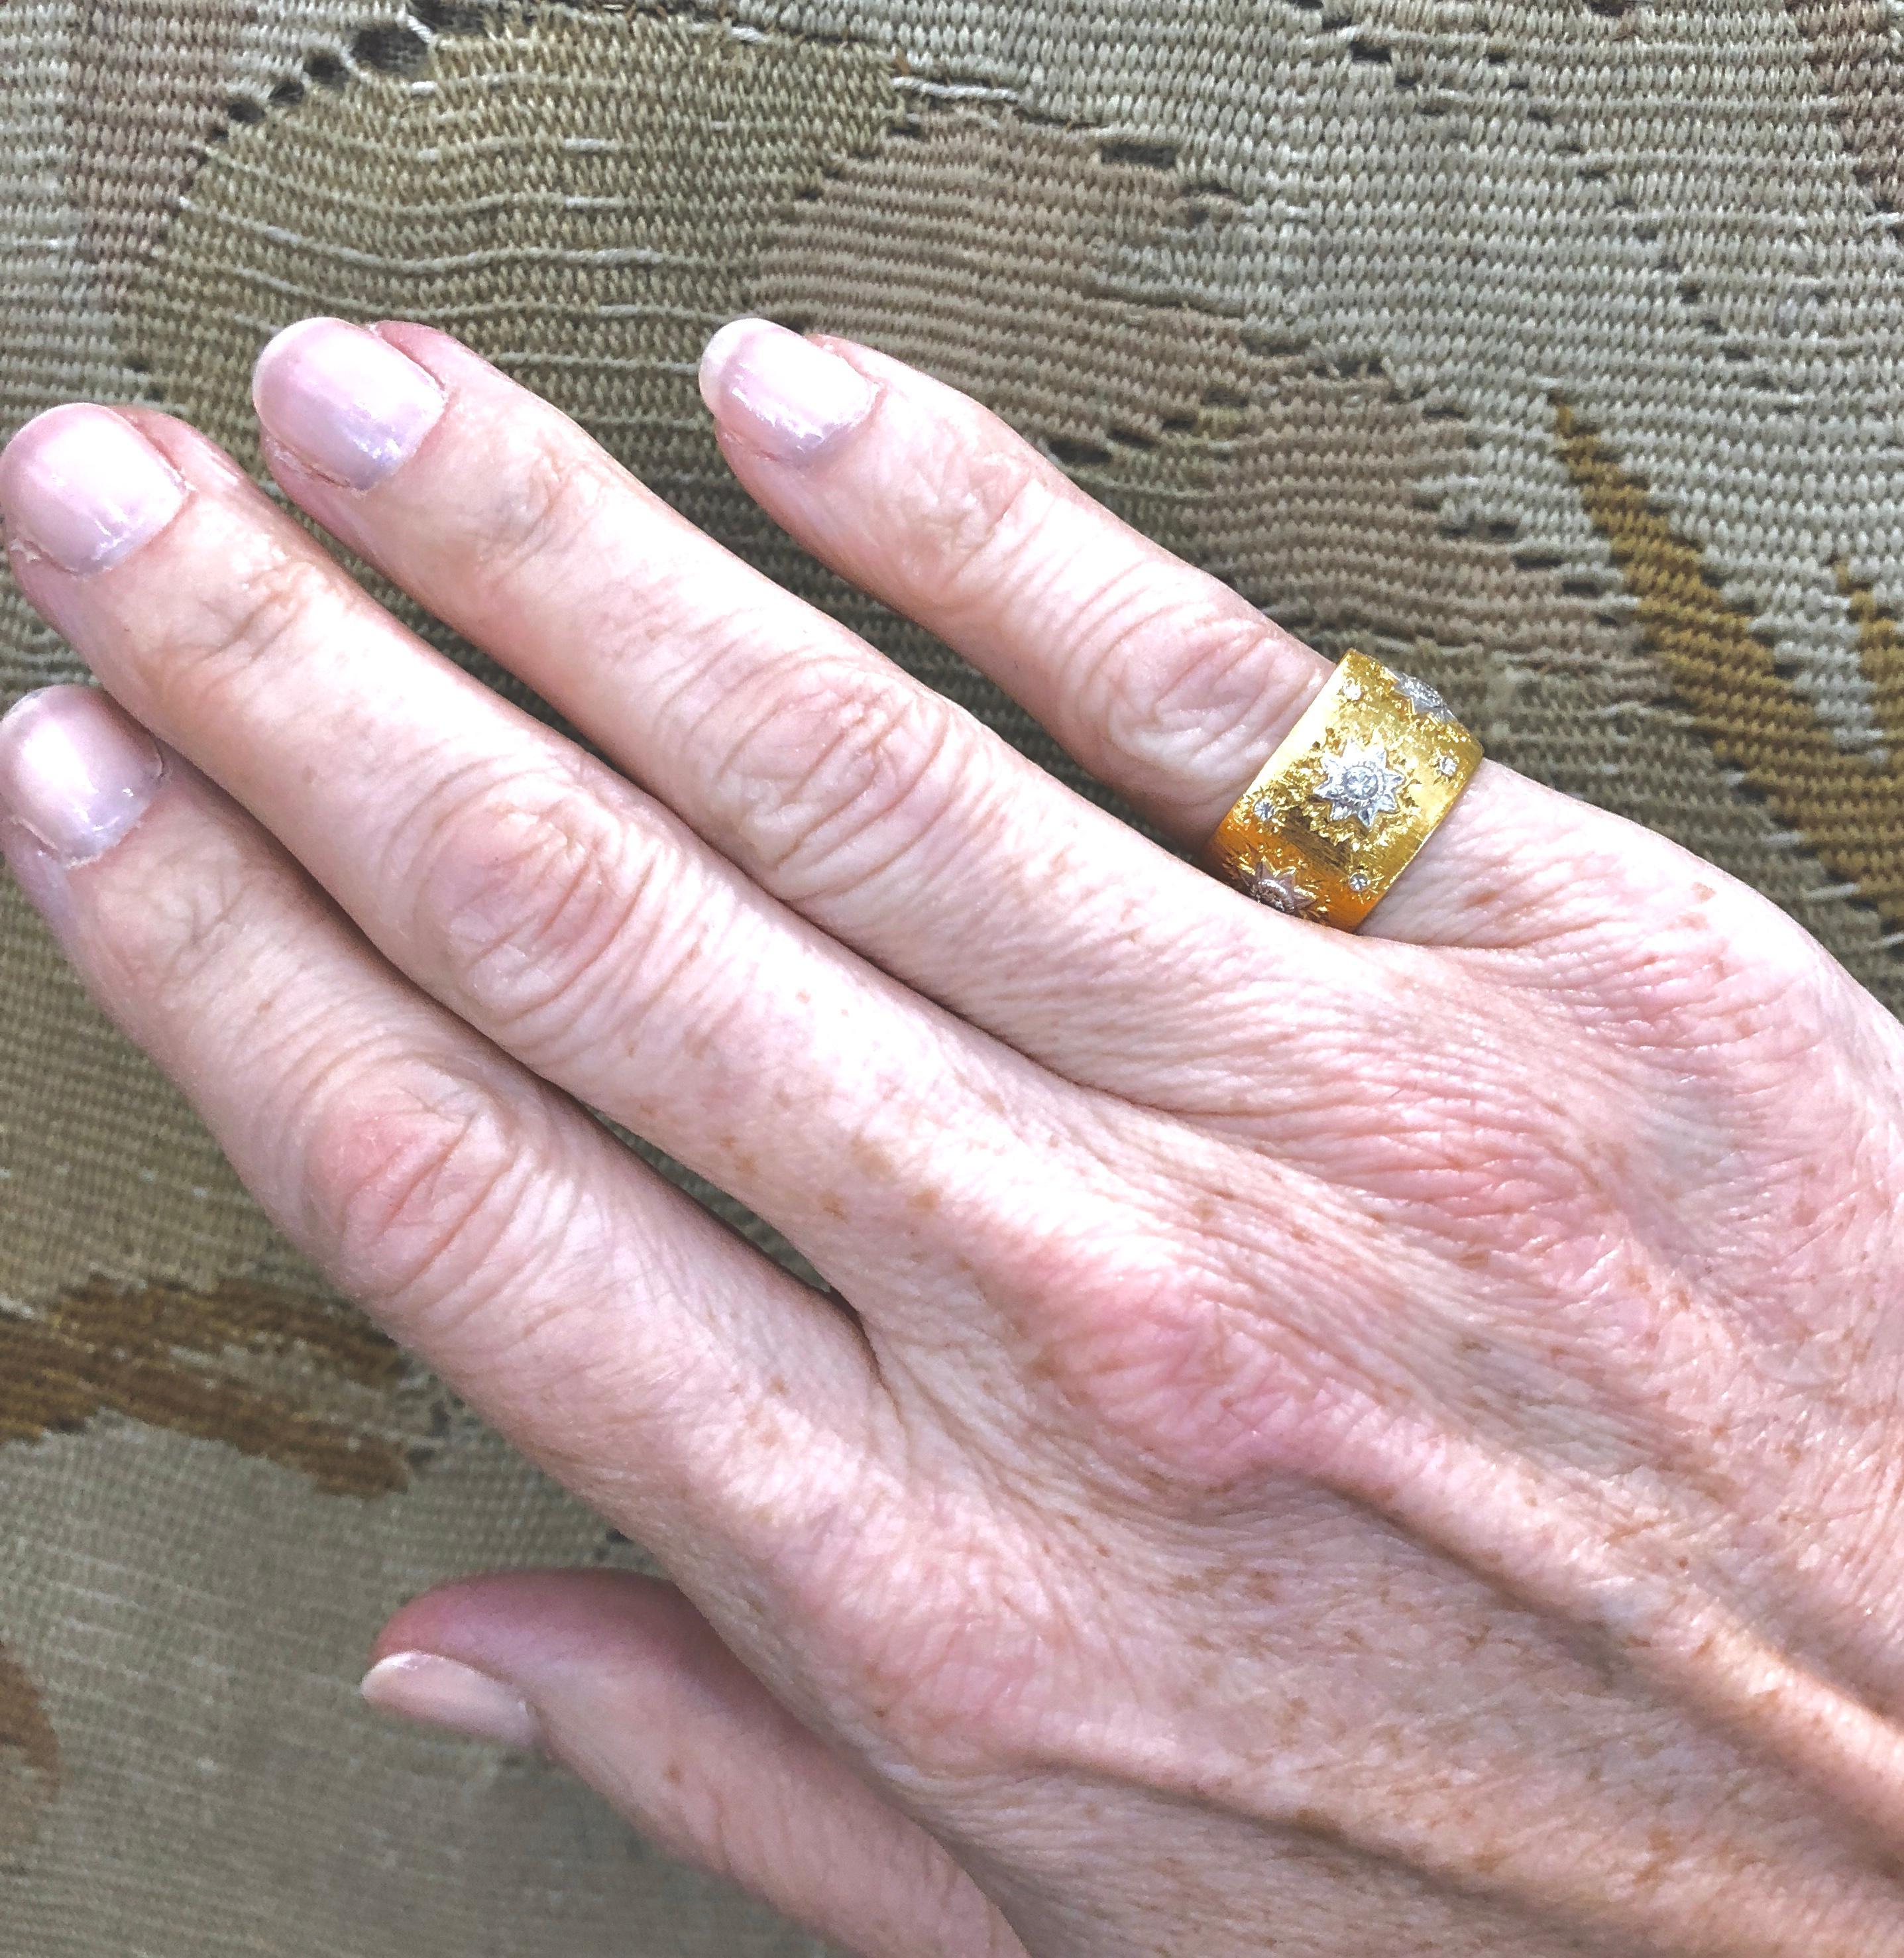 Mario Buccellati Diamond Gold Band For Sale at 1stdibs